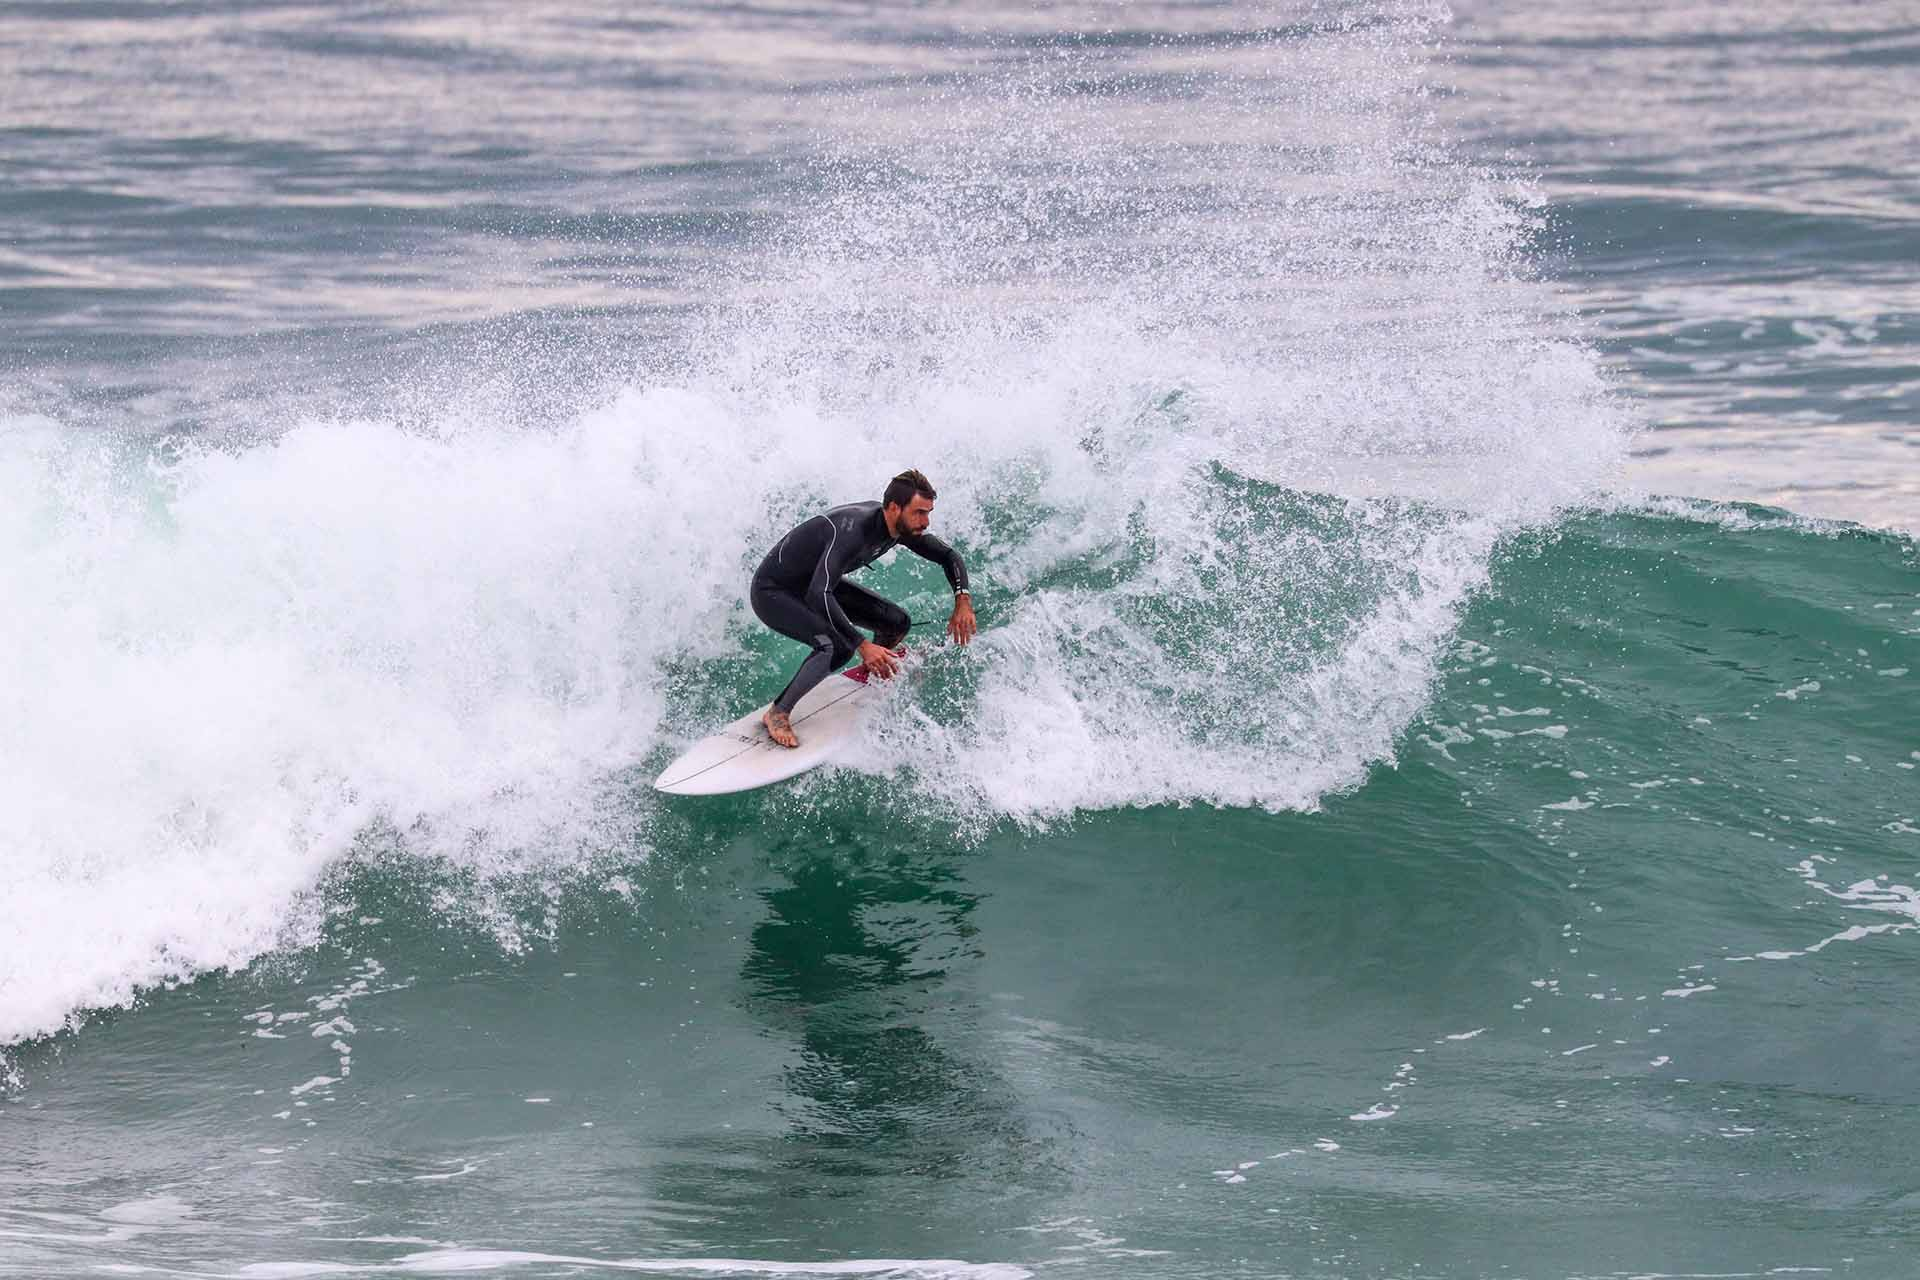 photographe surf clement philippon